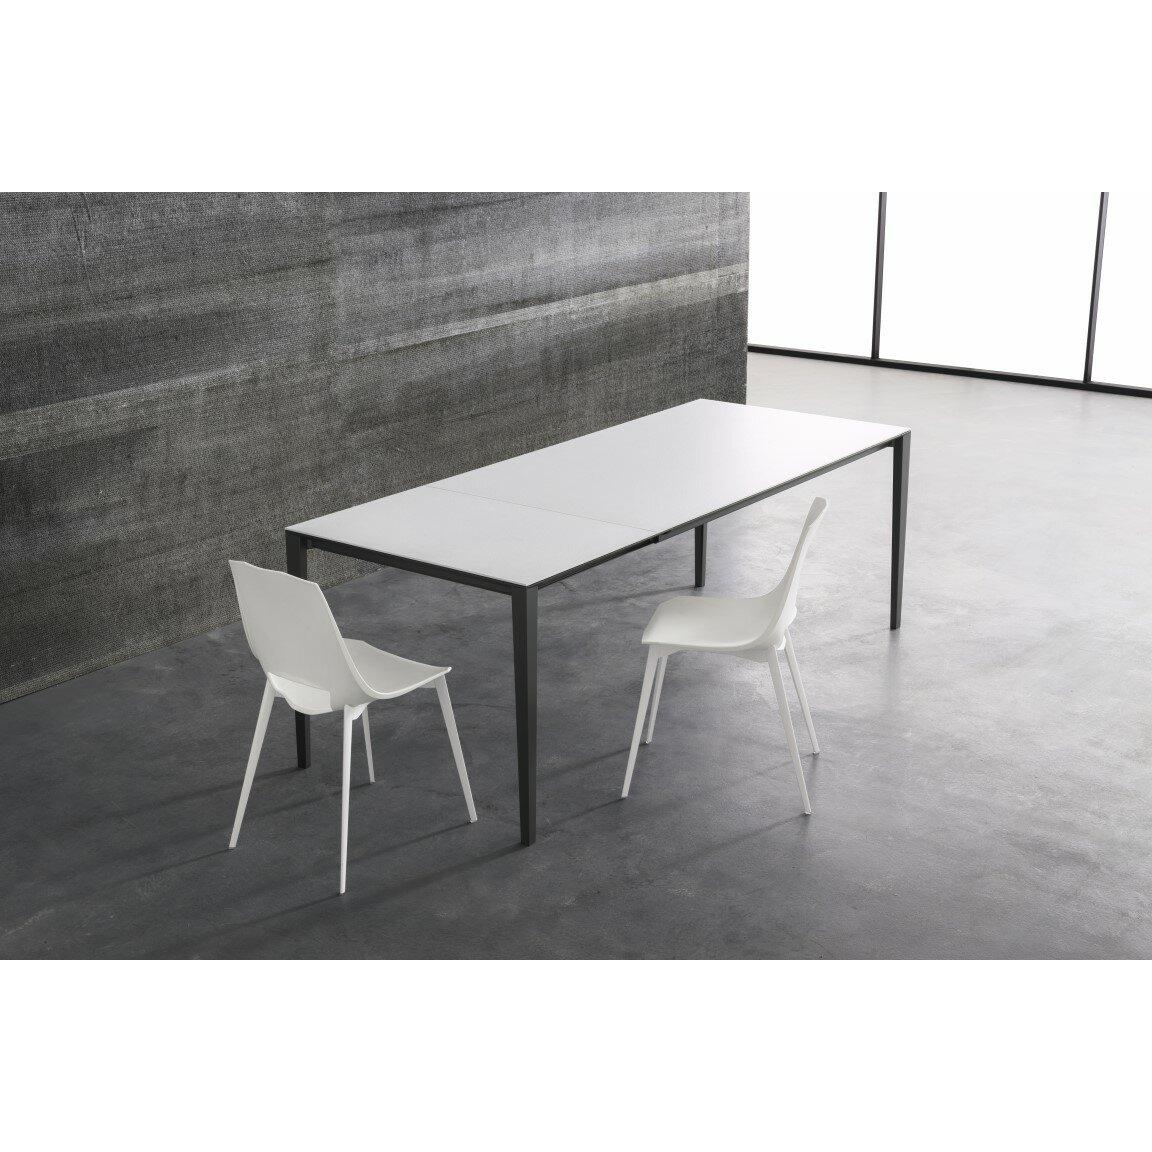 Zen Extendable Dining Table AllModern : YumanMod Zen Extendable Dining Table from www.allmodern.com size 1152 x 1152 jpeg 186kB